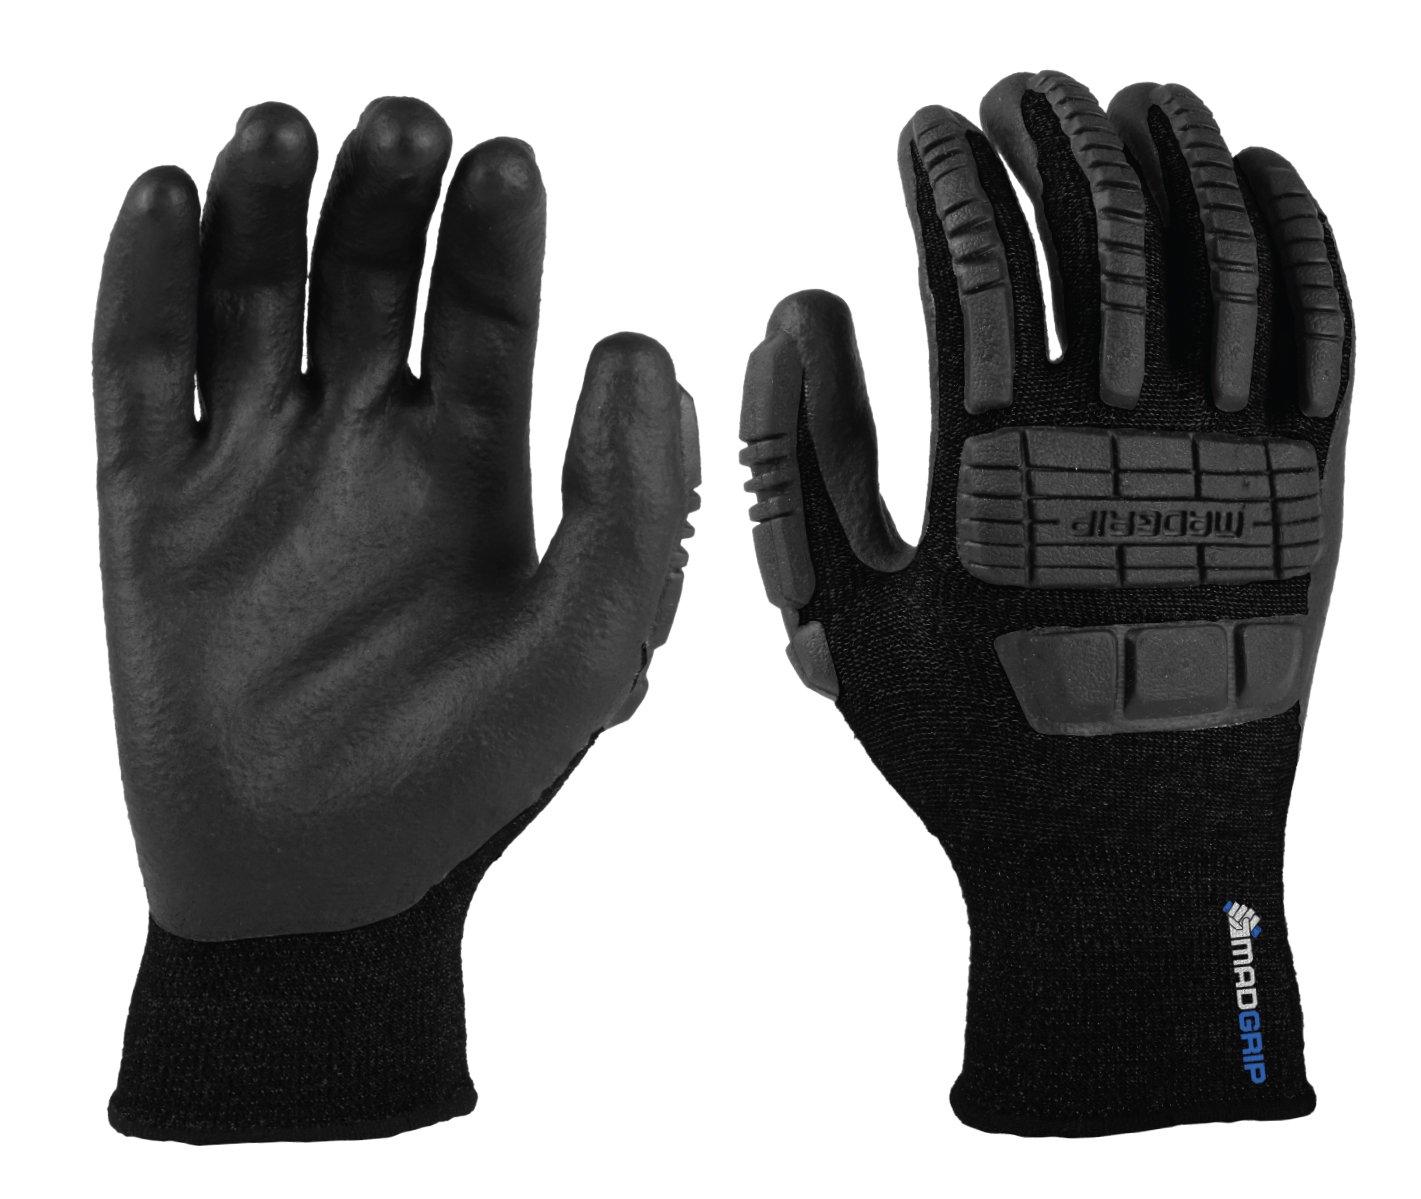 MadGrip Ergo Impact Thermal Glove